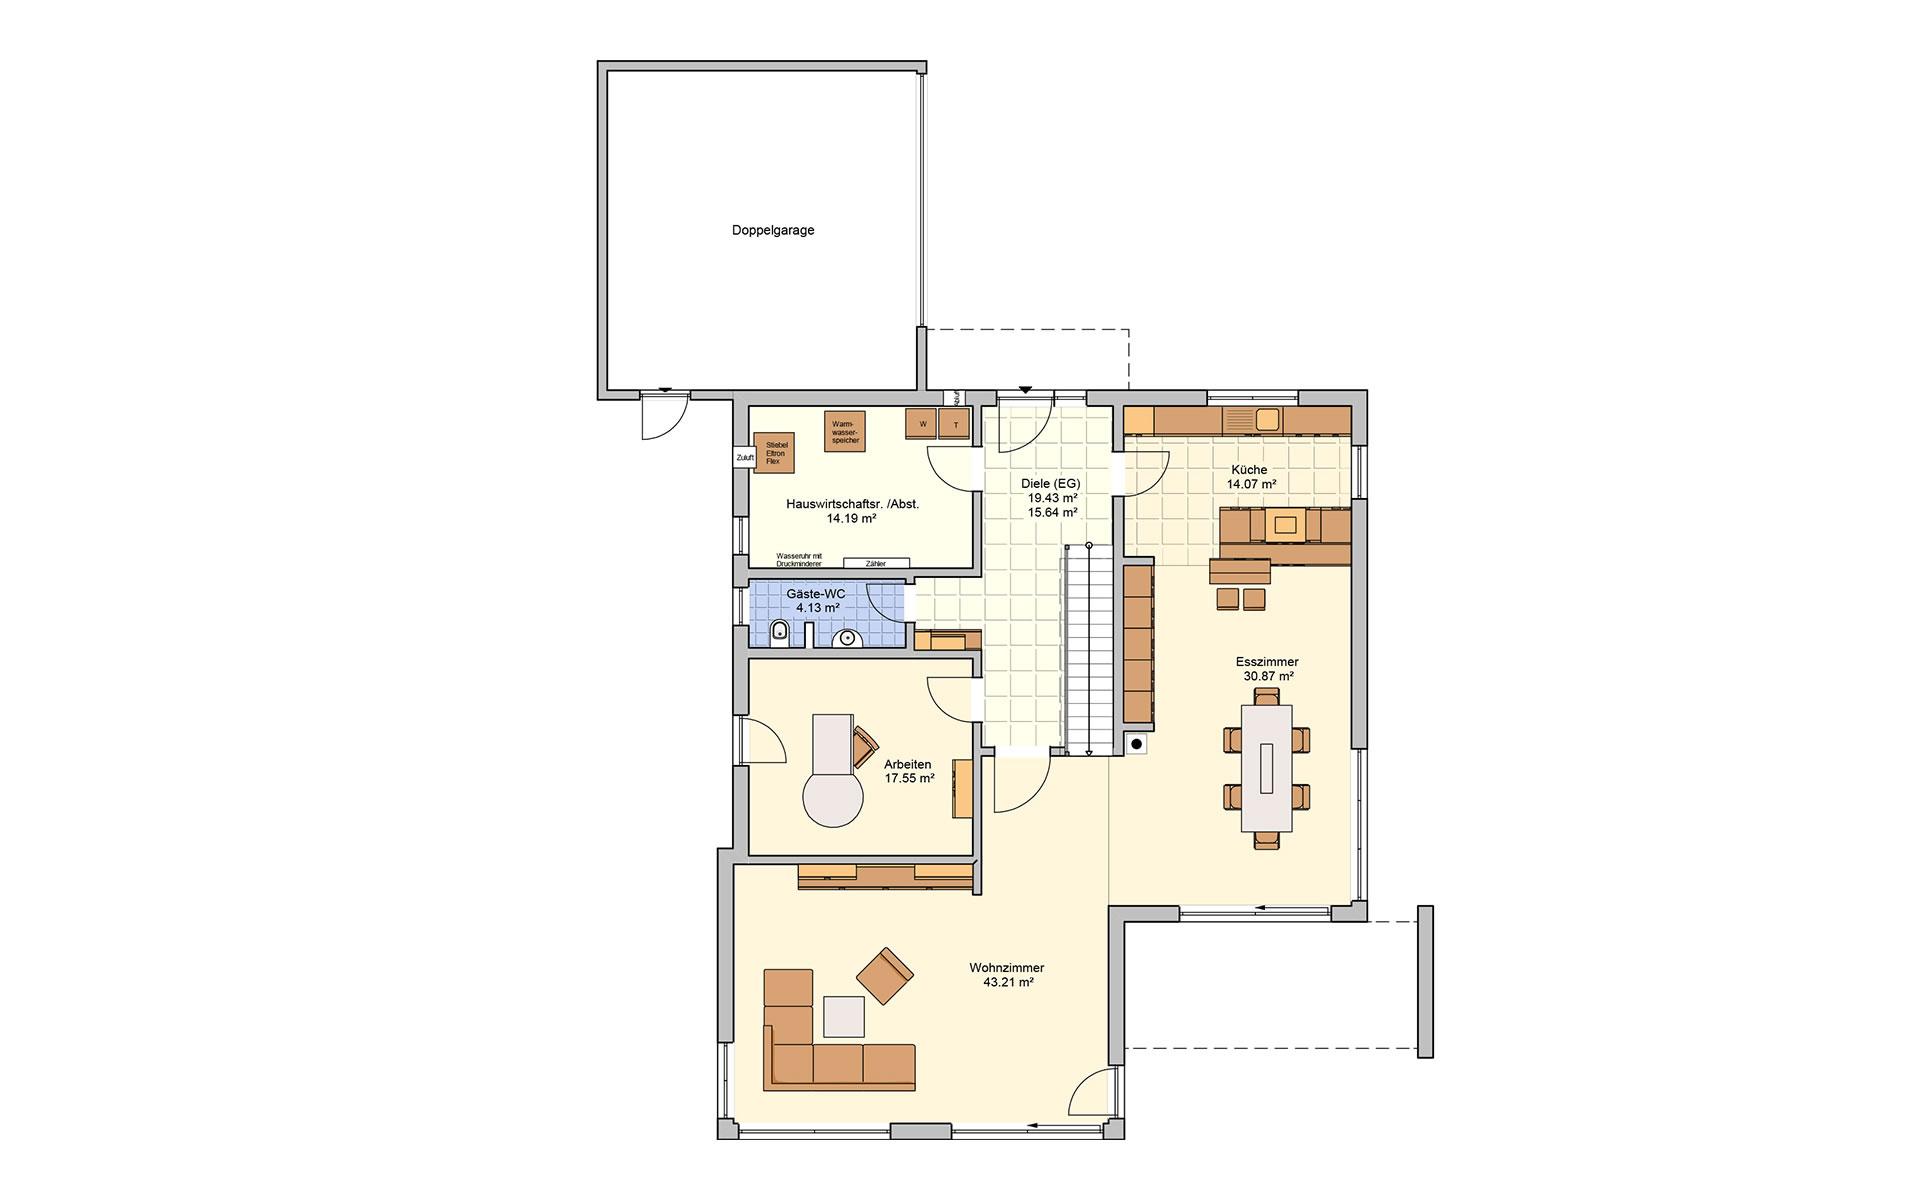 Erdgeschoss Matene von Fingerhut Haus GmbH & Co. KG